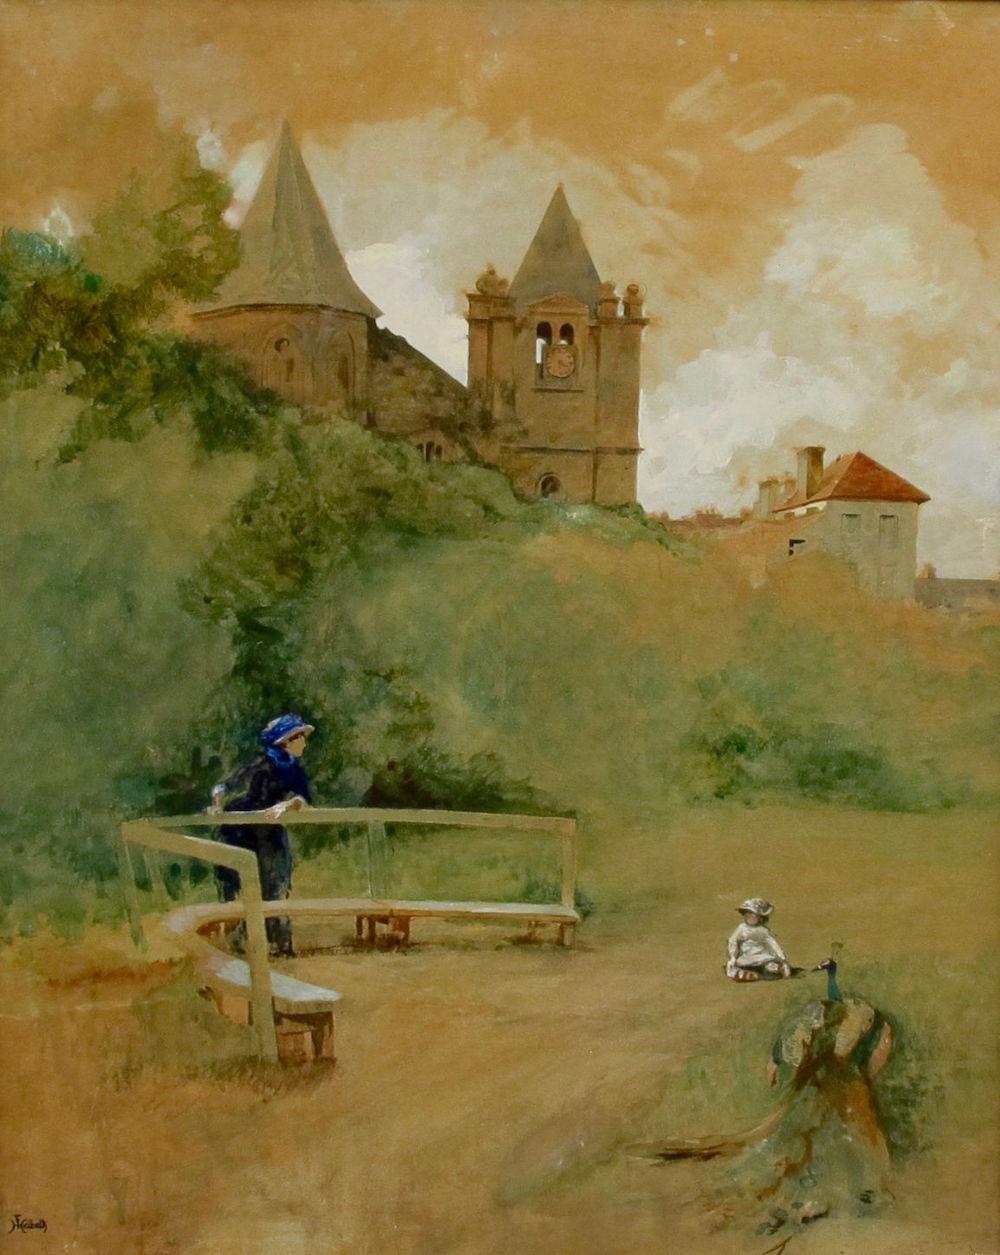 Фердинанд Гейльбют (1826 Гамбург- 1889 Париж) - В парке